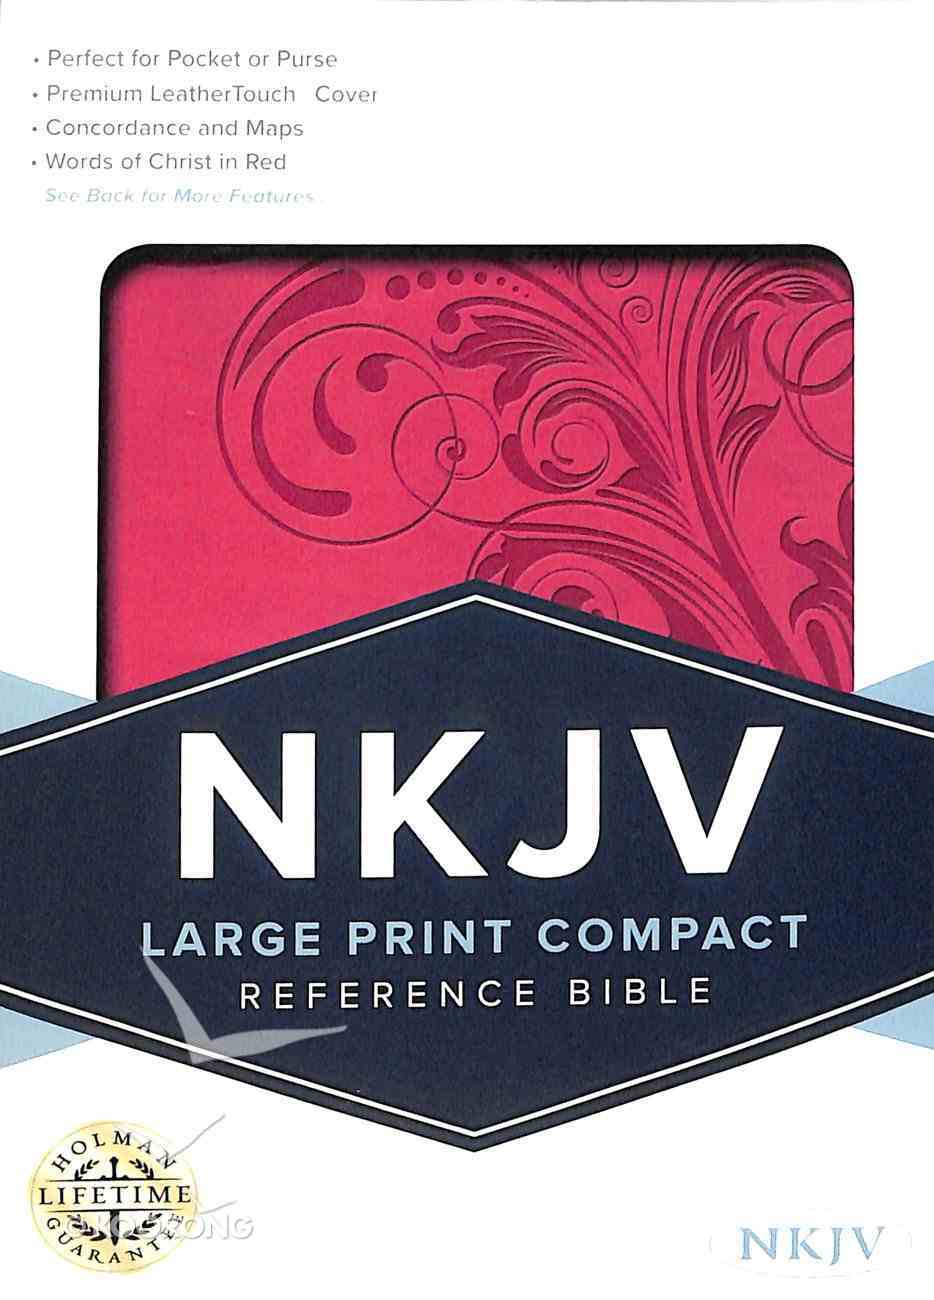 NKJV Large Print Compact Reference Bible Pink Imitation Leather